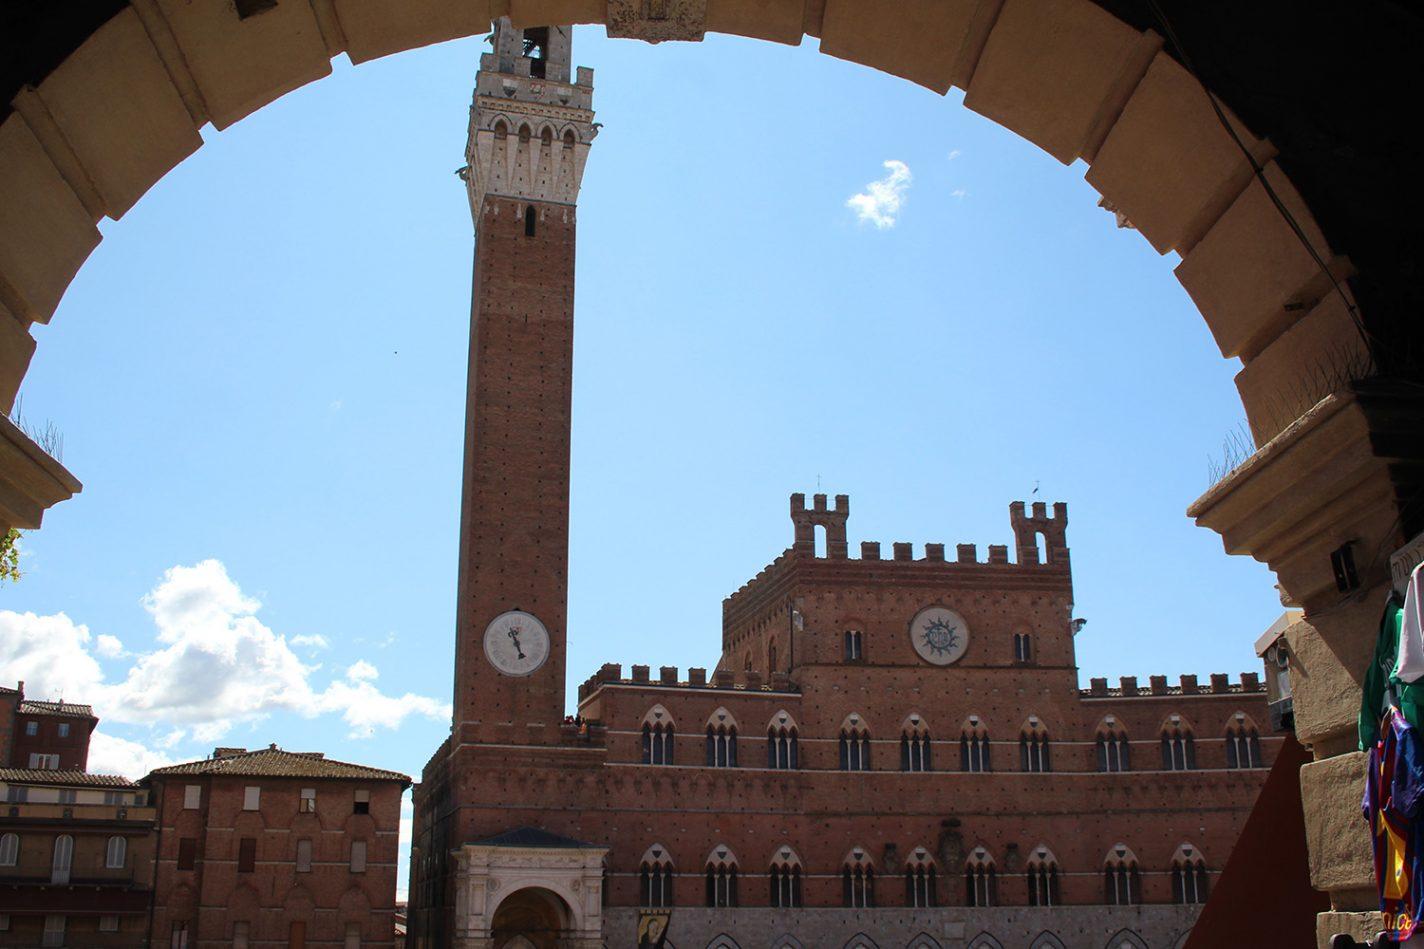 Uitzicht op Palazzo Pubblico en Torre del Mangia